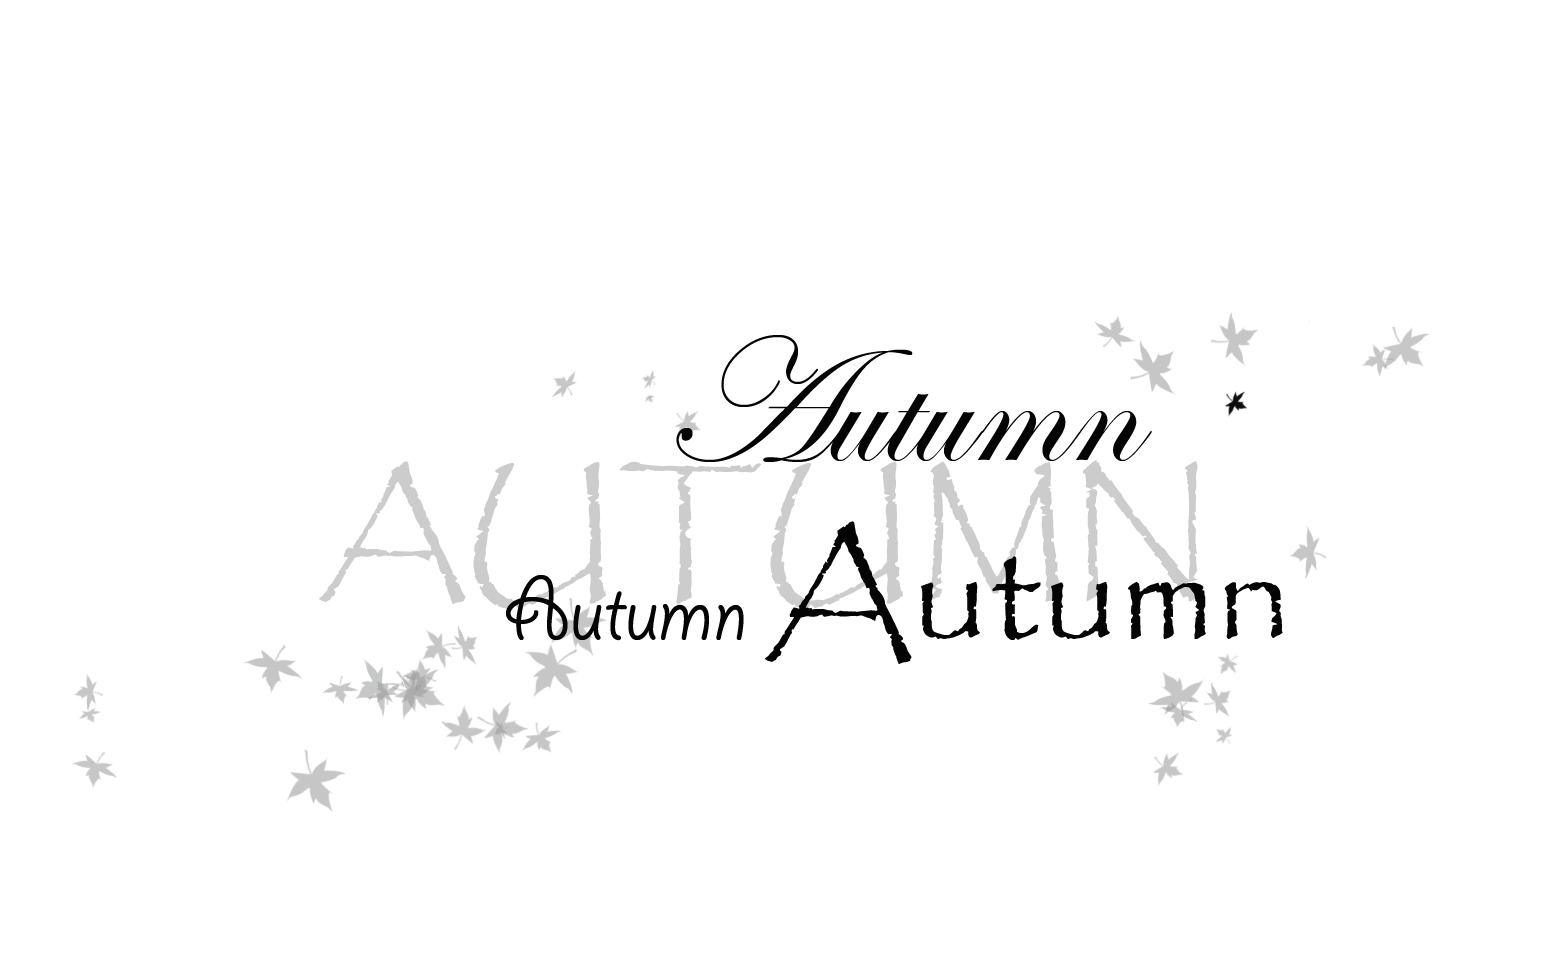 http://4.bp.blogspot.com/-YGG-Sfcp9io/VEOXOZDBthI/AAAAAAAACj4/fSHFFzVW_4E/s1600/autumn.png